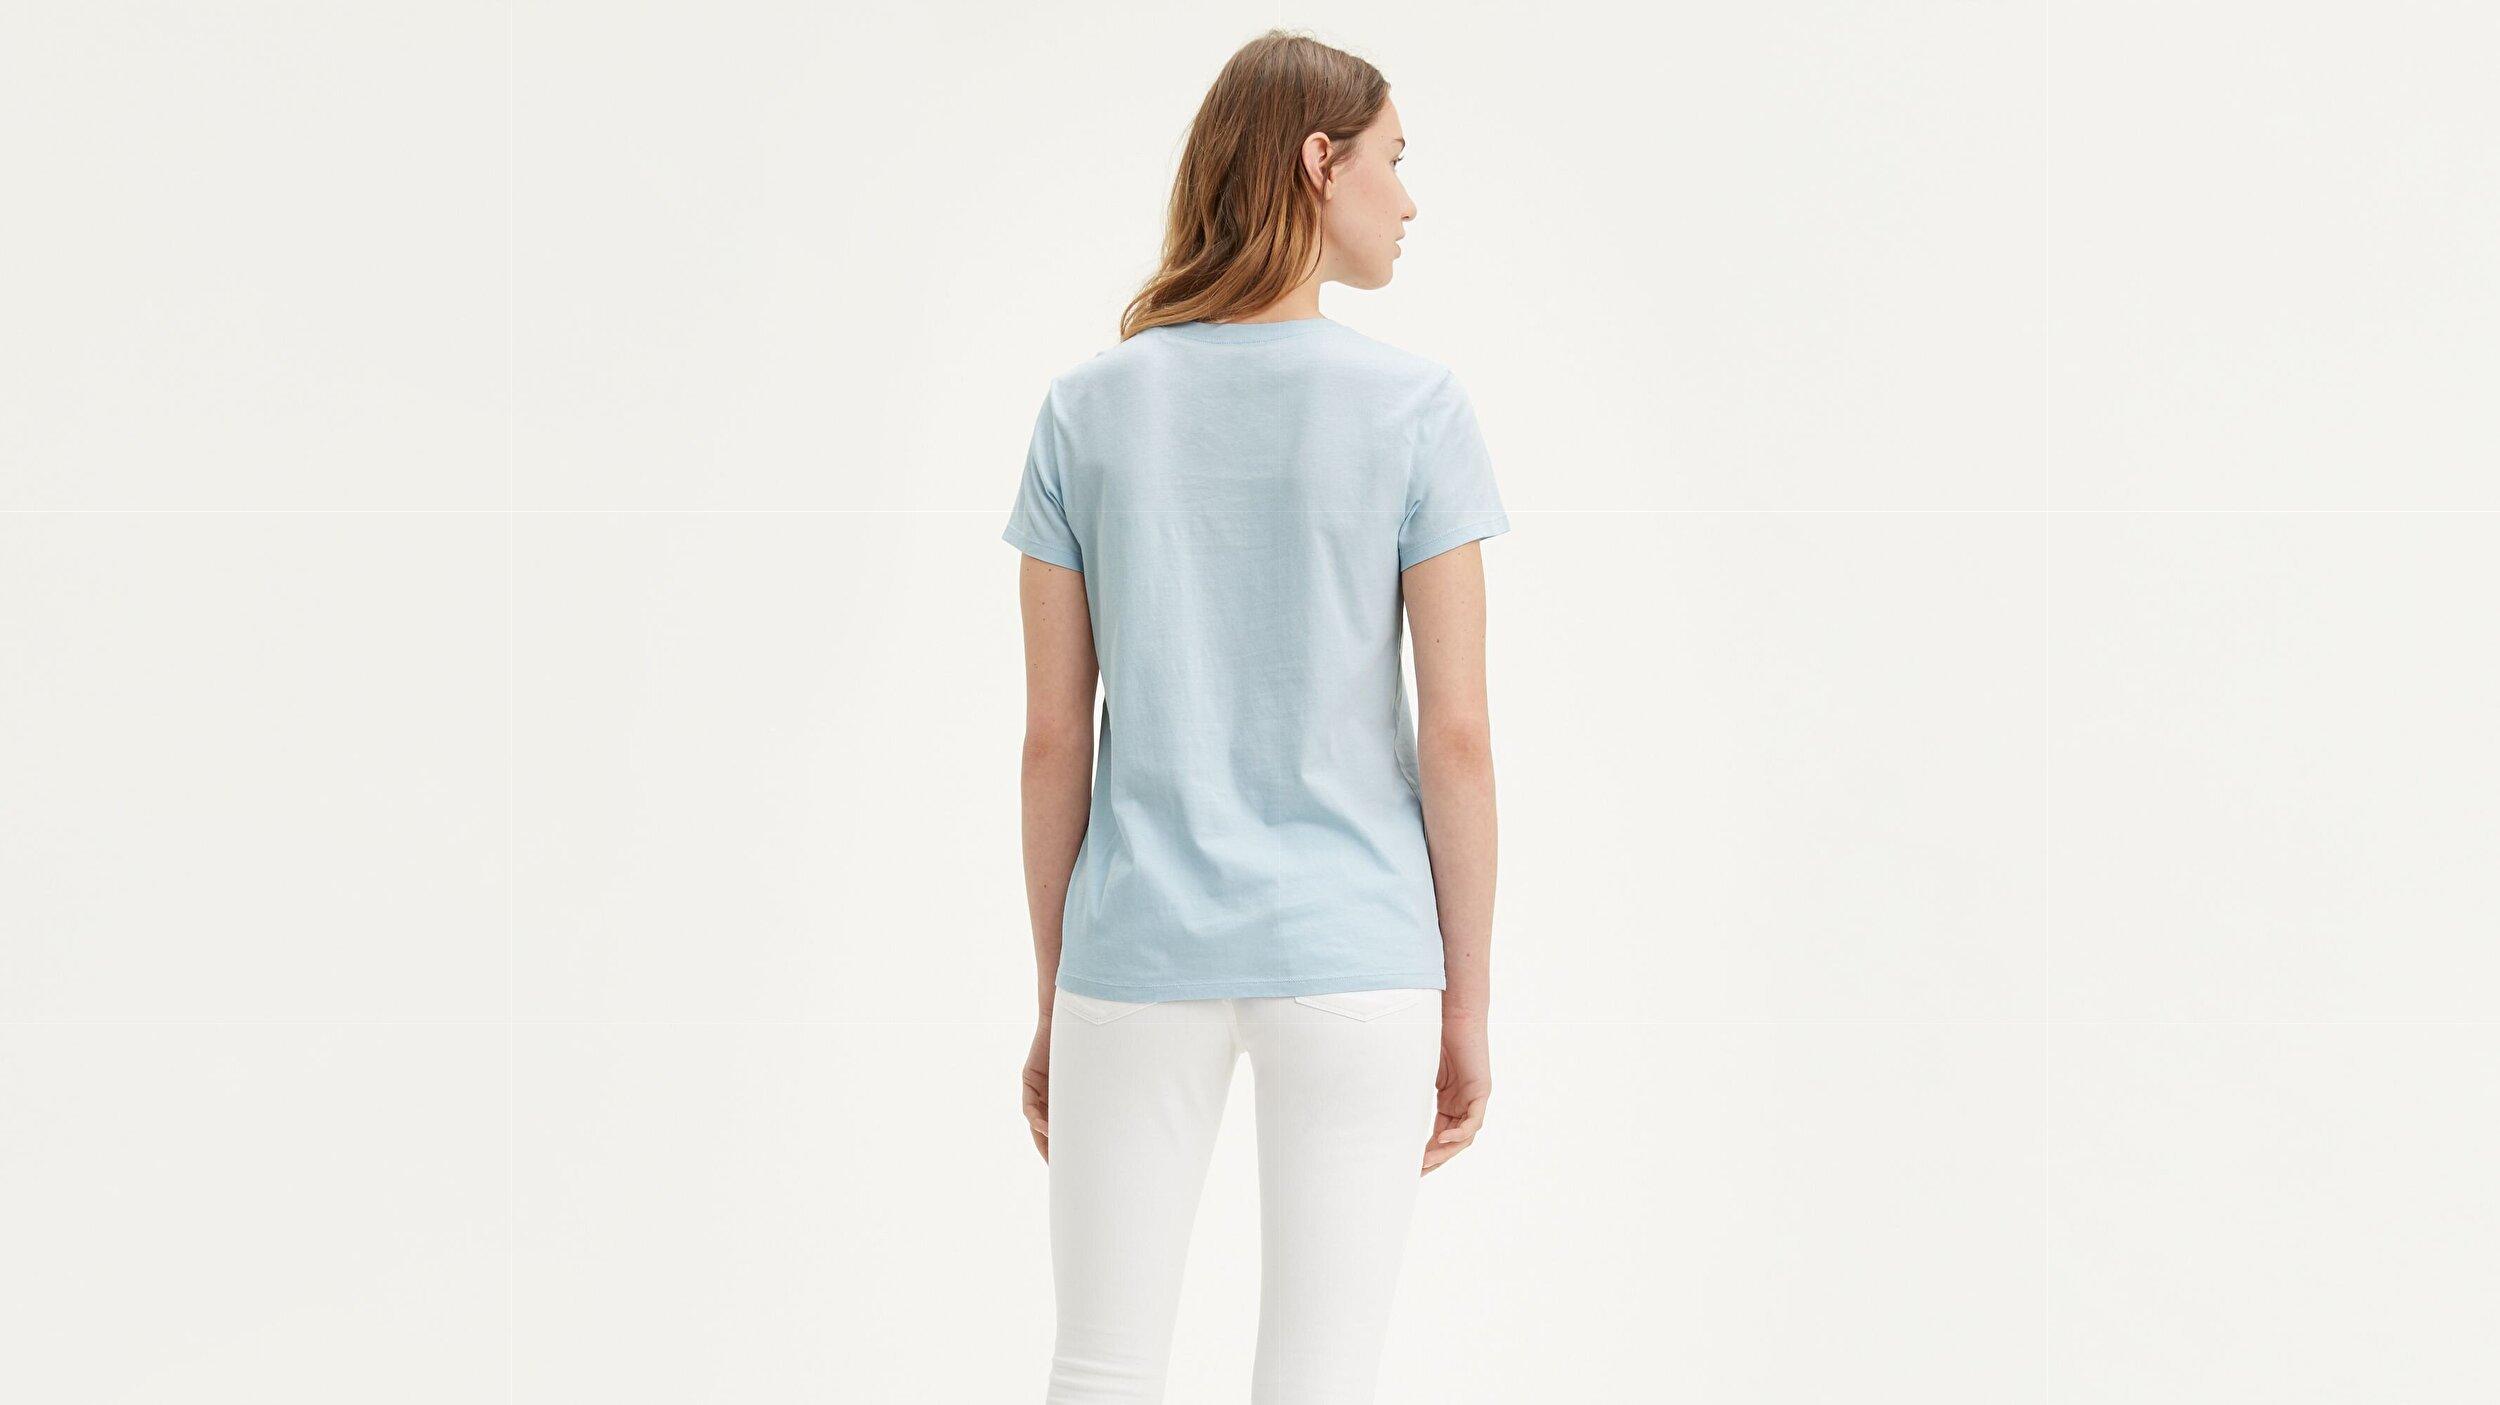 The Perfect Tee Bw T3 Mavi Kadın Tişört